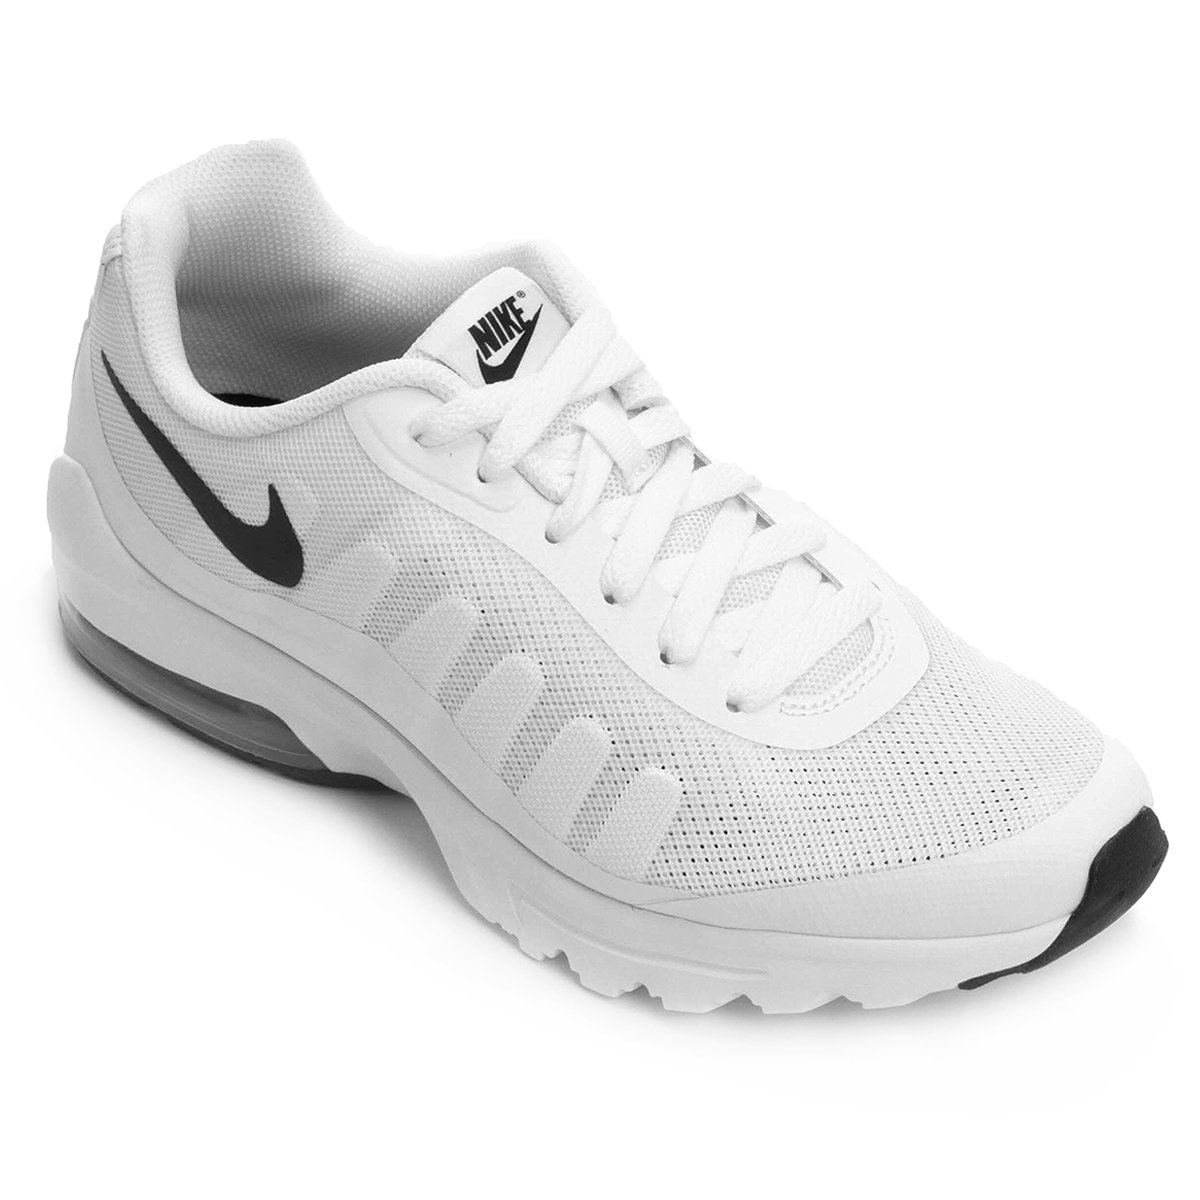 42ea6baf9 Tênis Nike Air Max Invigor Masculino - Branco e Preto - Compre Agora ...